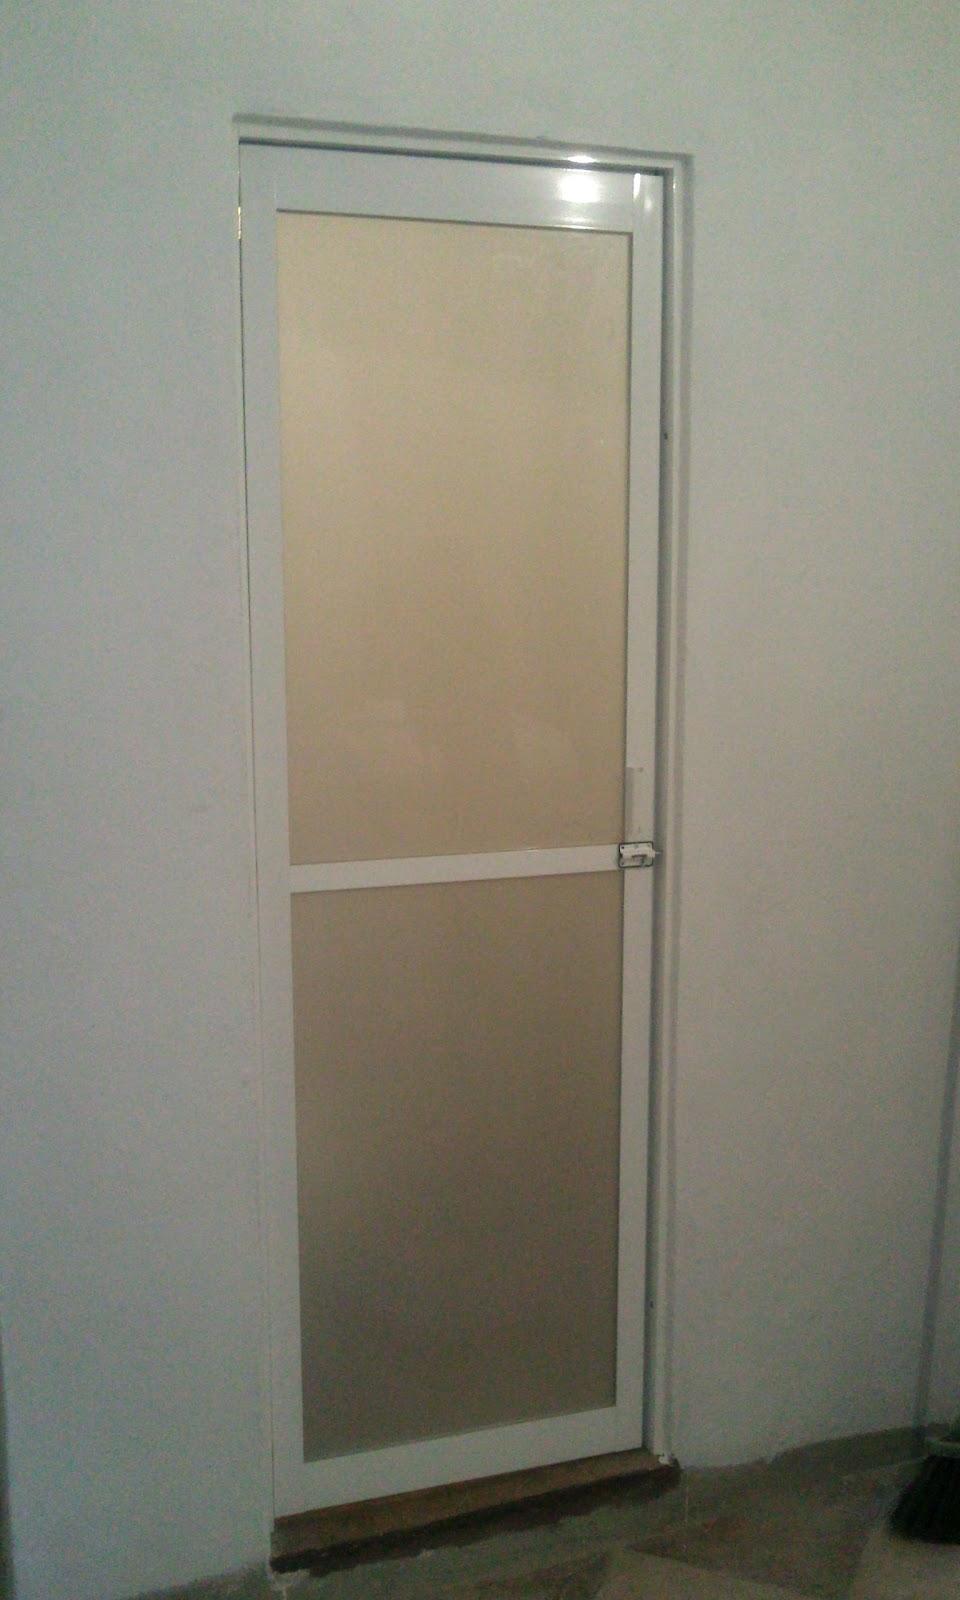 Puertas De Aluminio Blanco Para Baño:Puerta baño aluminio 2′ con acrilico de figura con pazadodes